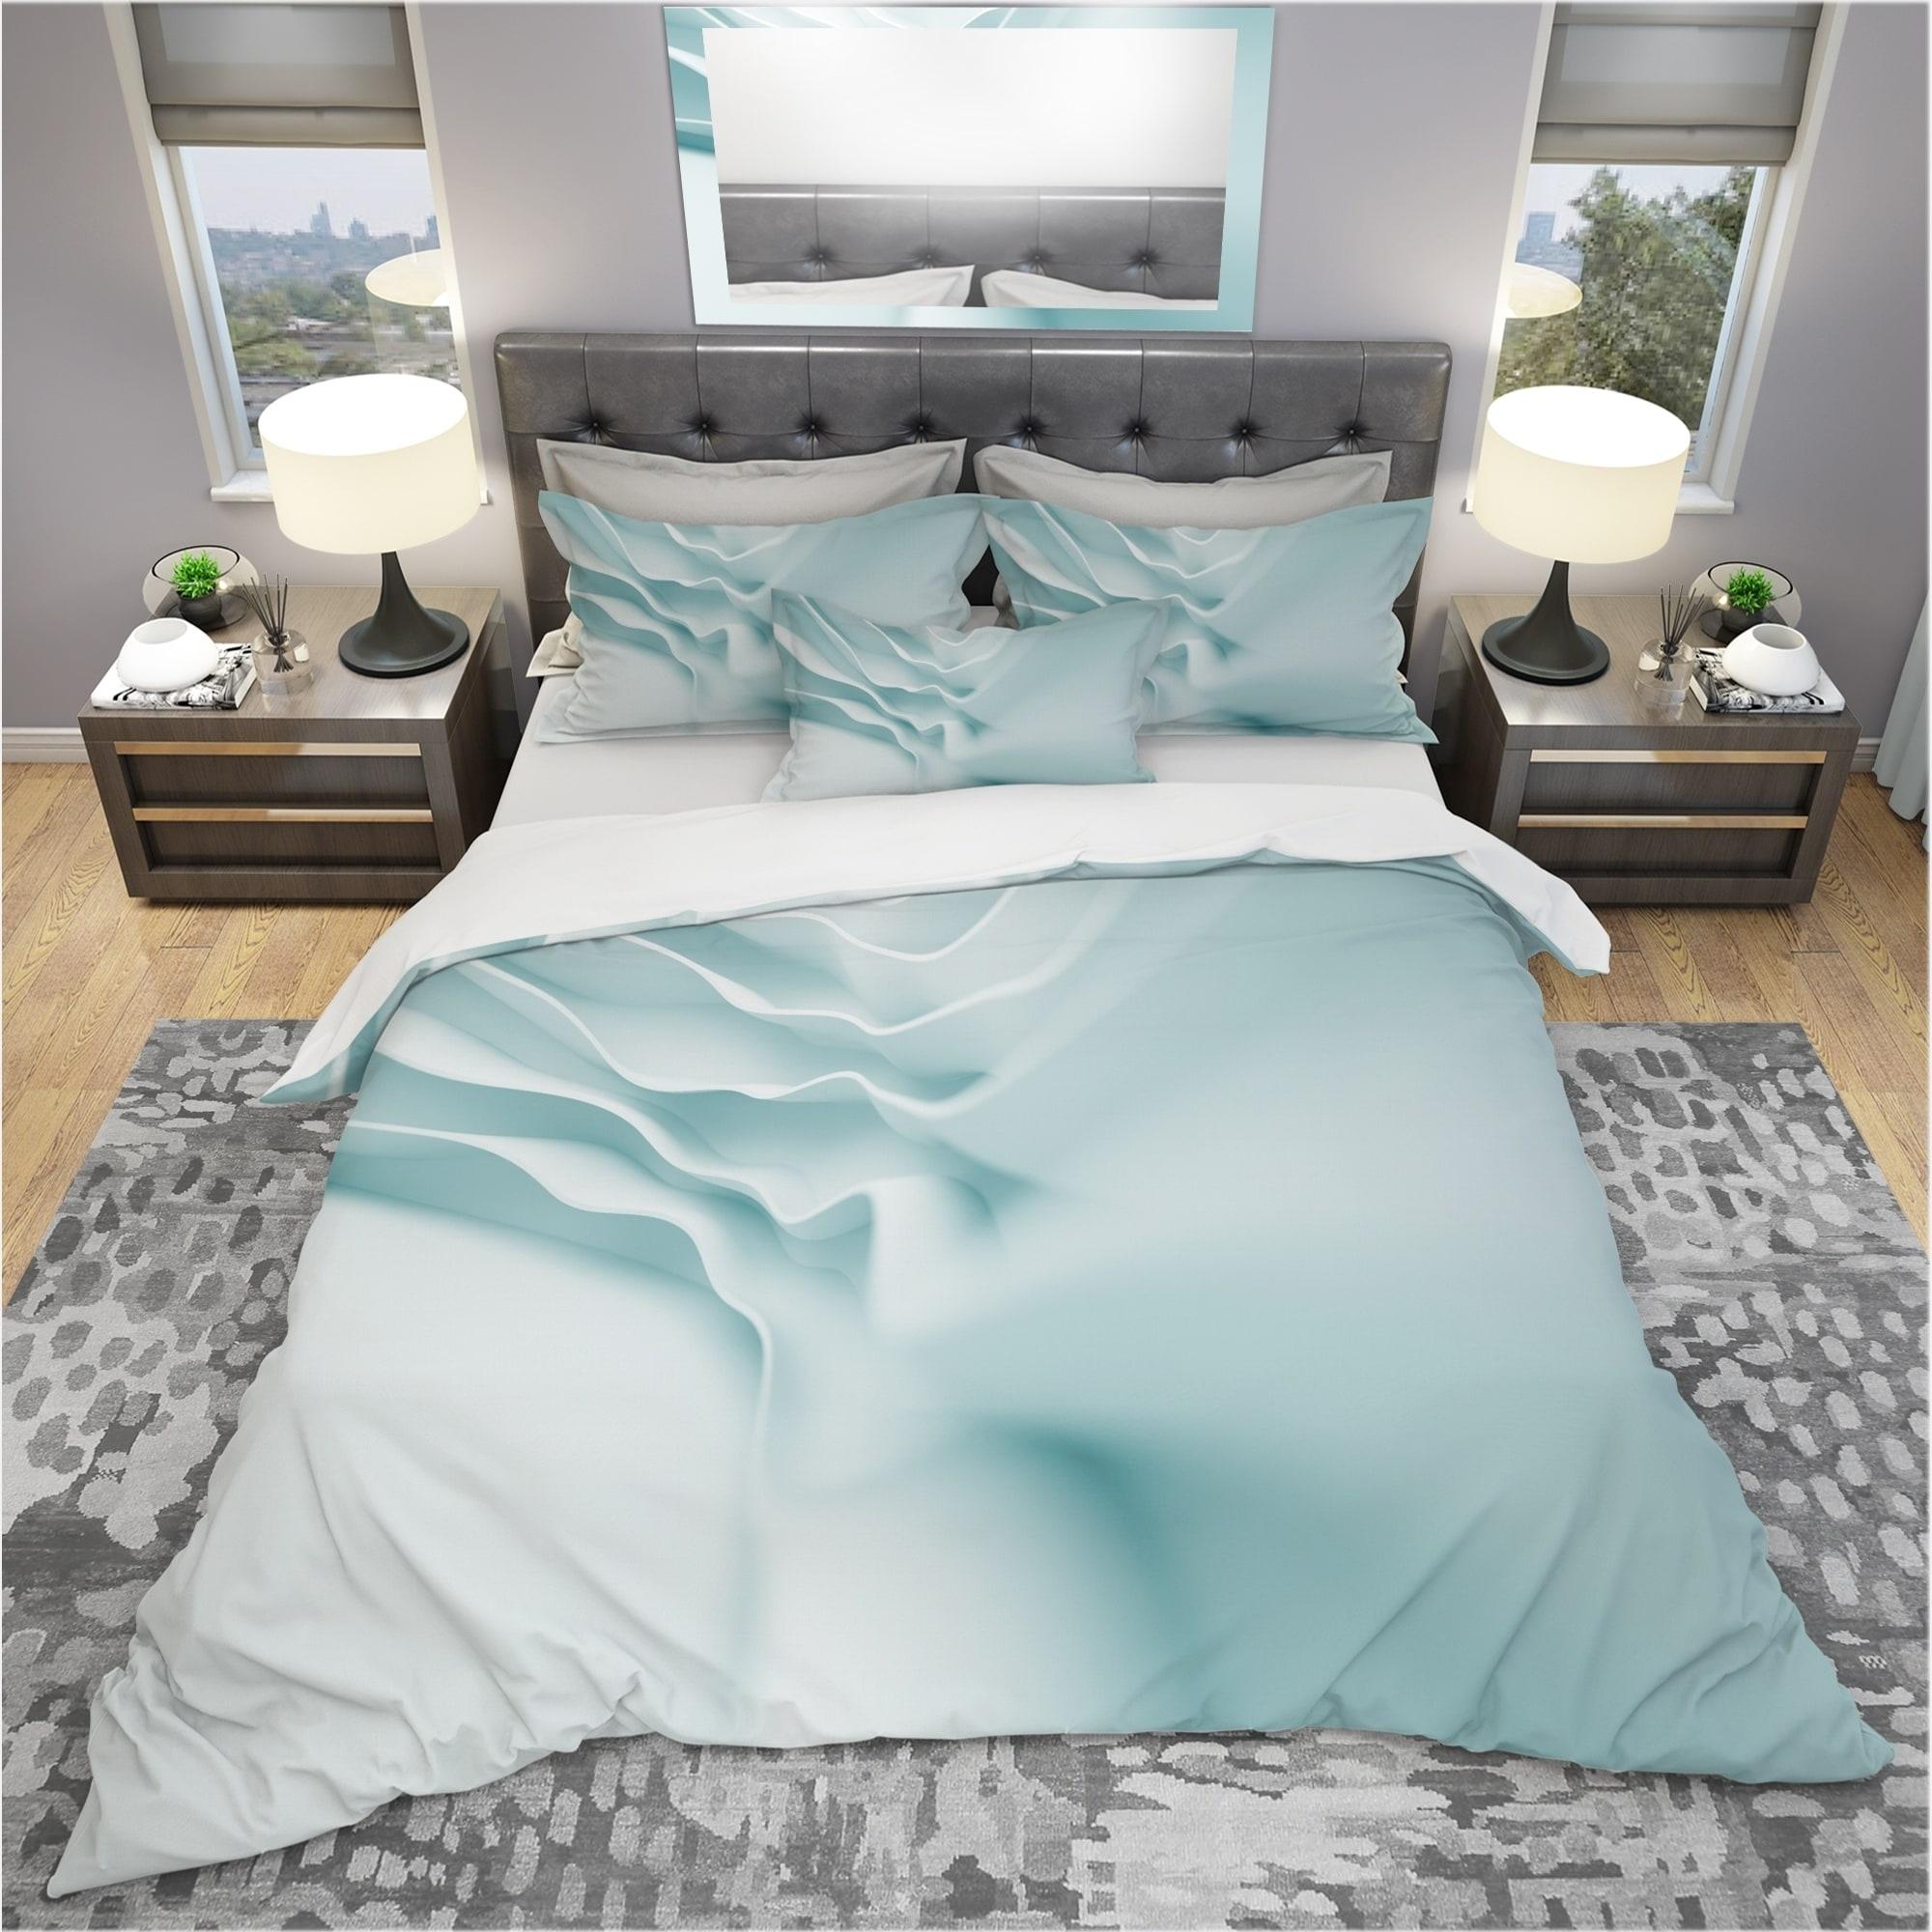 Designart 3d Light Blue Abstract Architecture Modern Contemporary Bedding Set Duvet Cover Shams On Sale Overstock 24240710